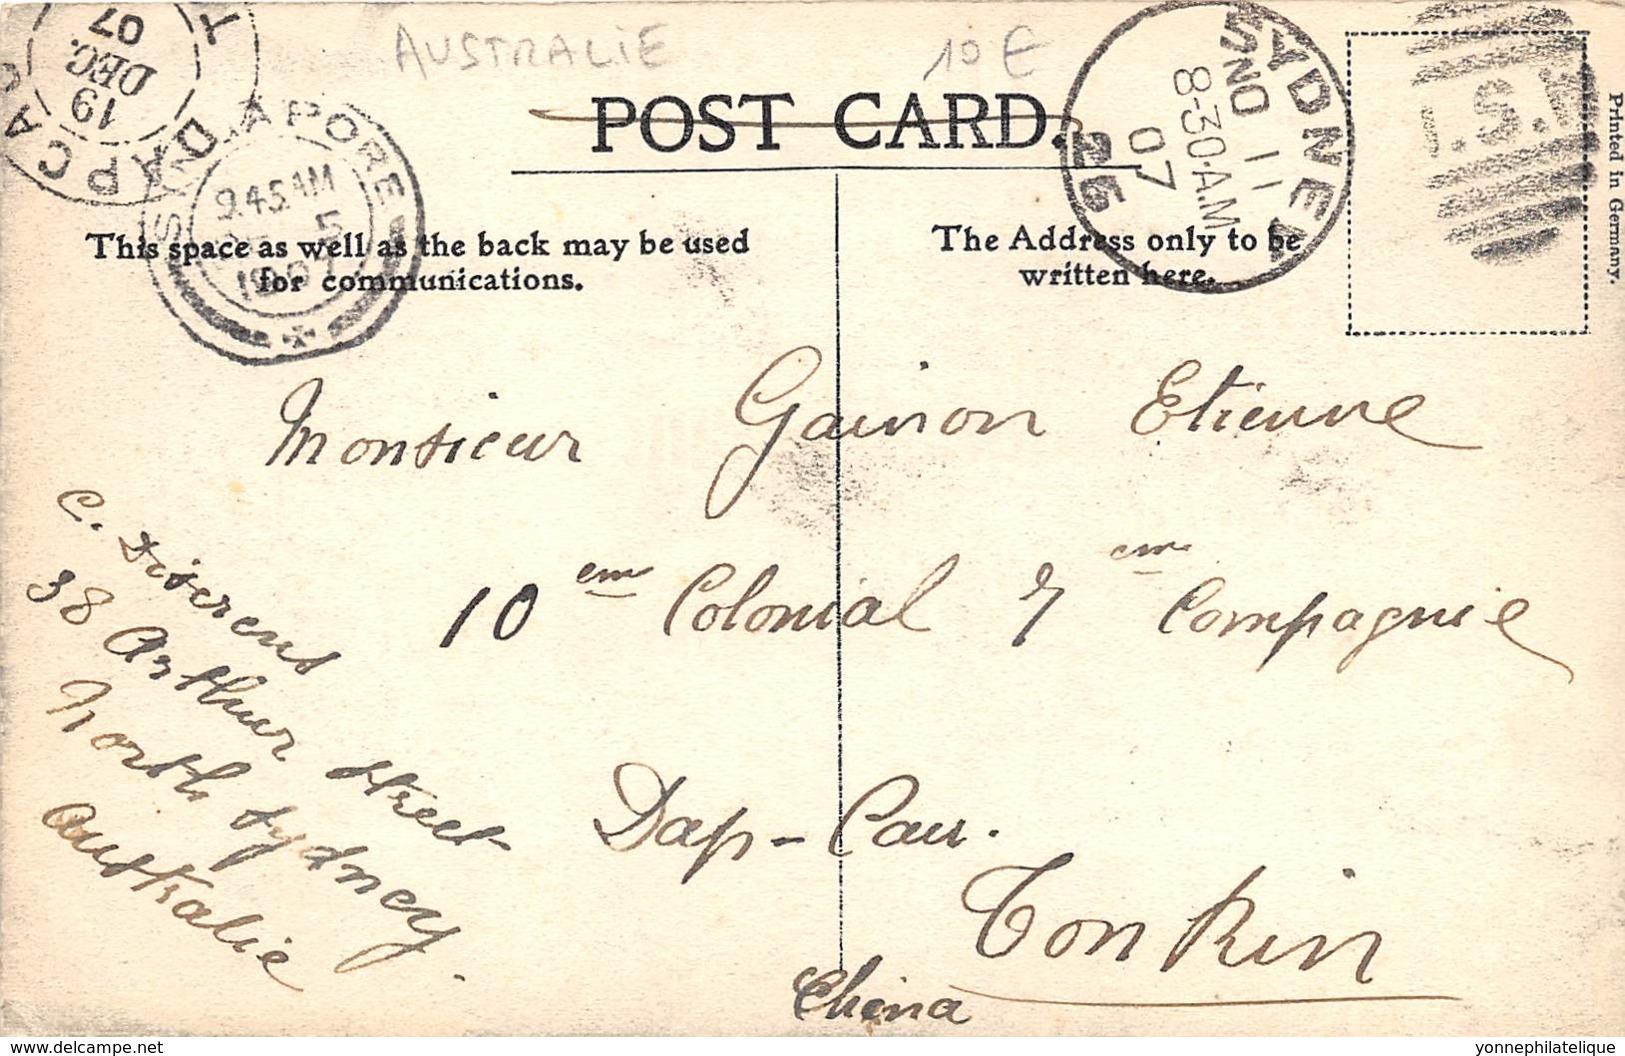 Australie - Kerry - Sydney - Australie